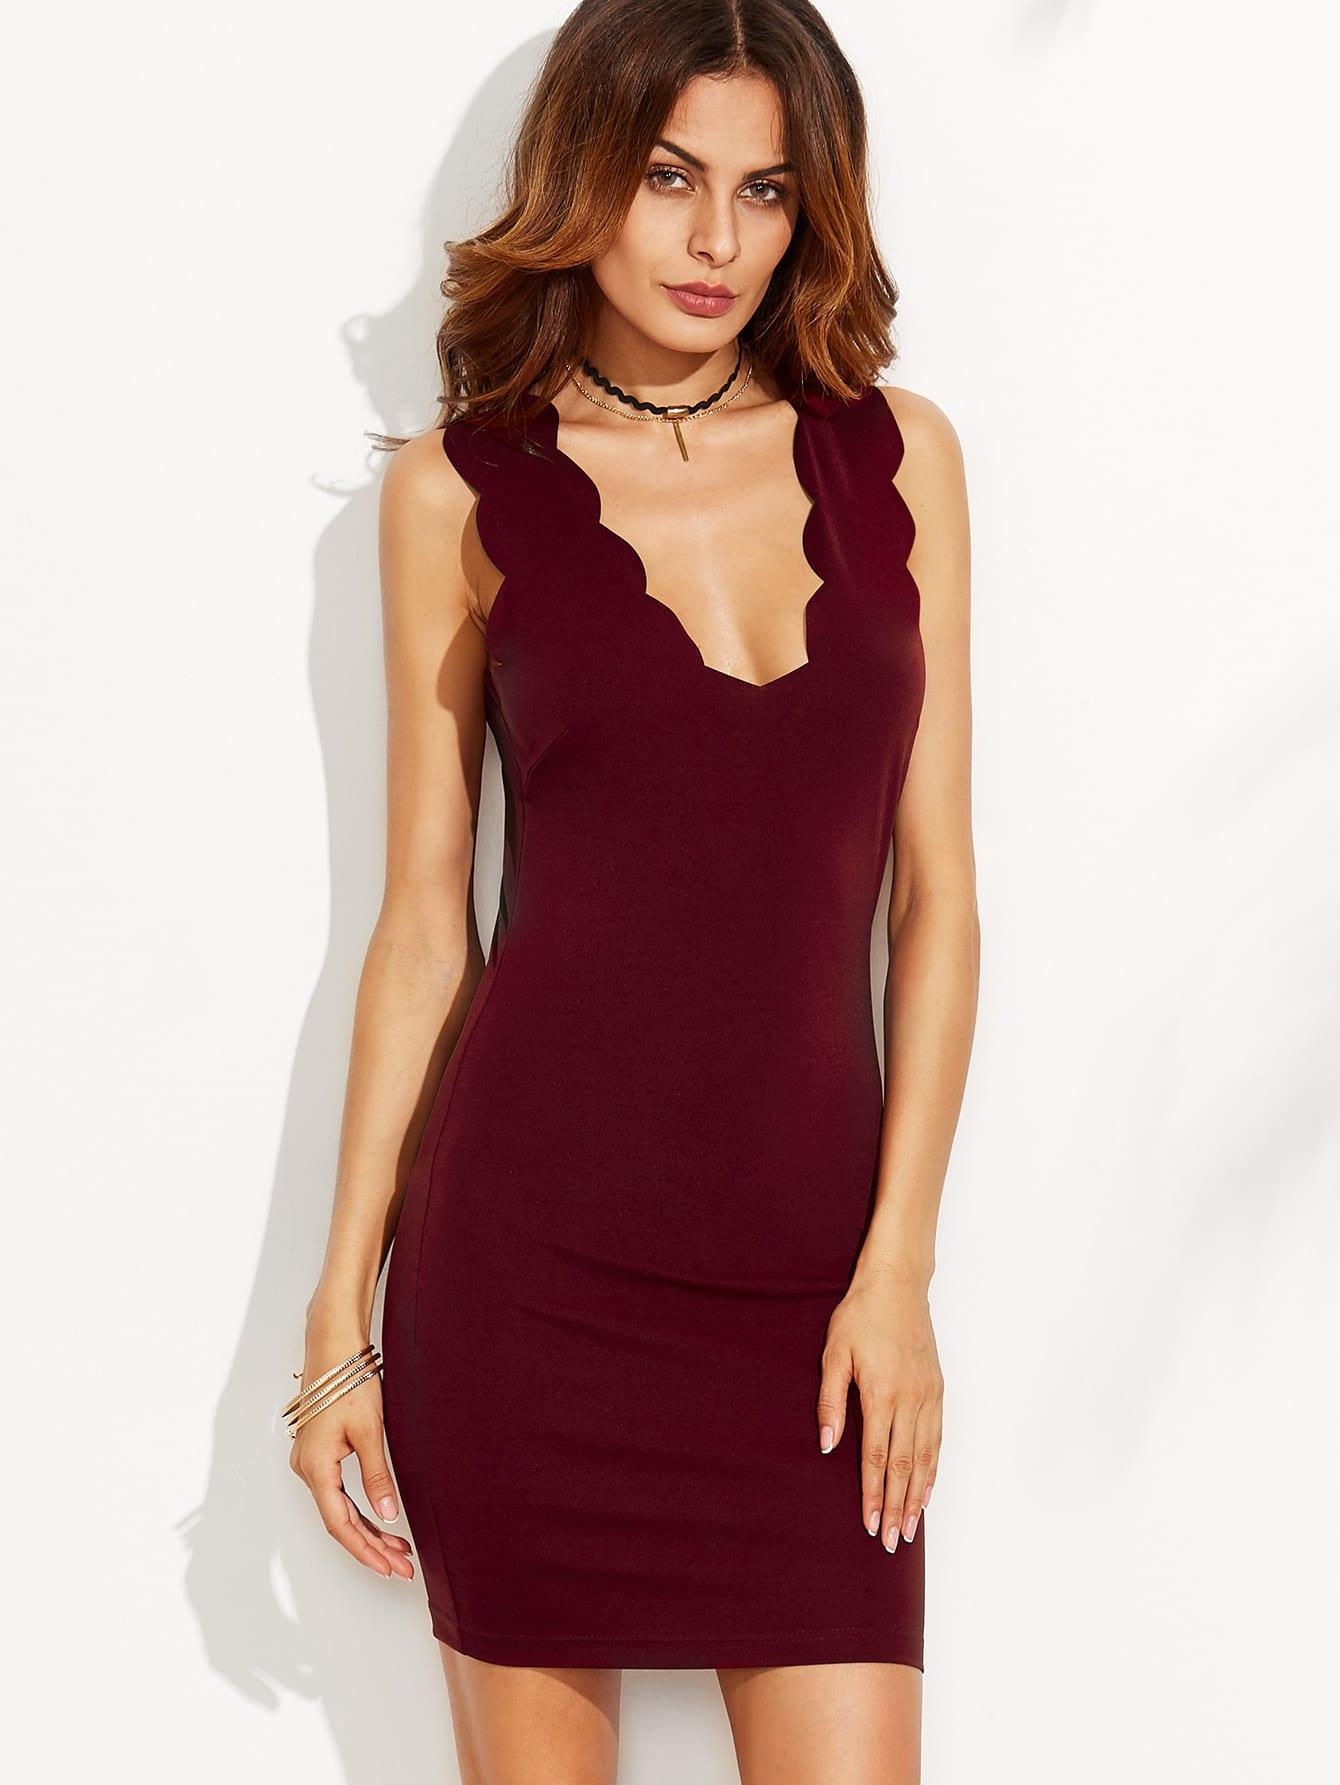 Scallop Plunging Neckline Bodycon Dress bardot neckline scallop hem dress